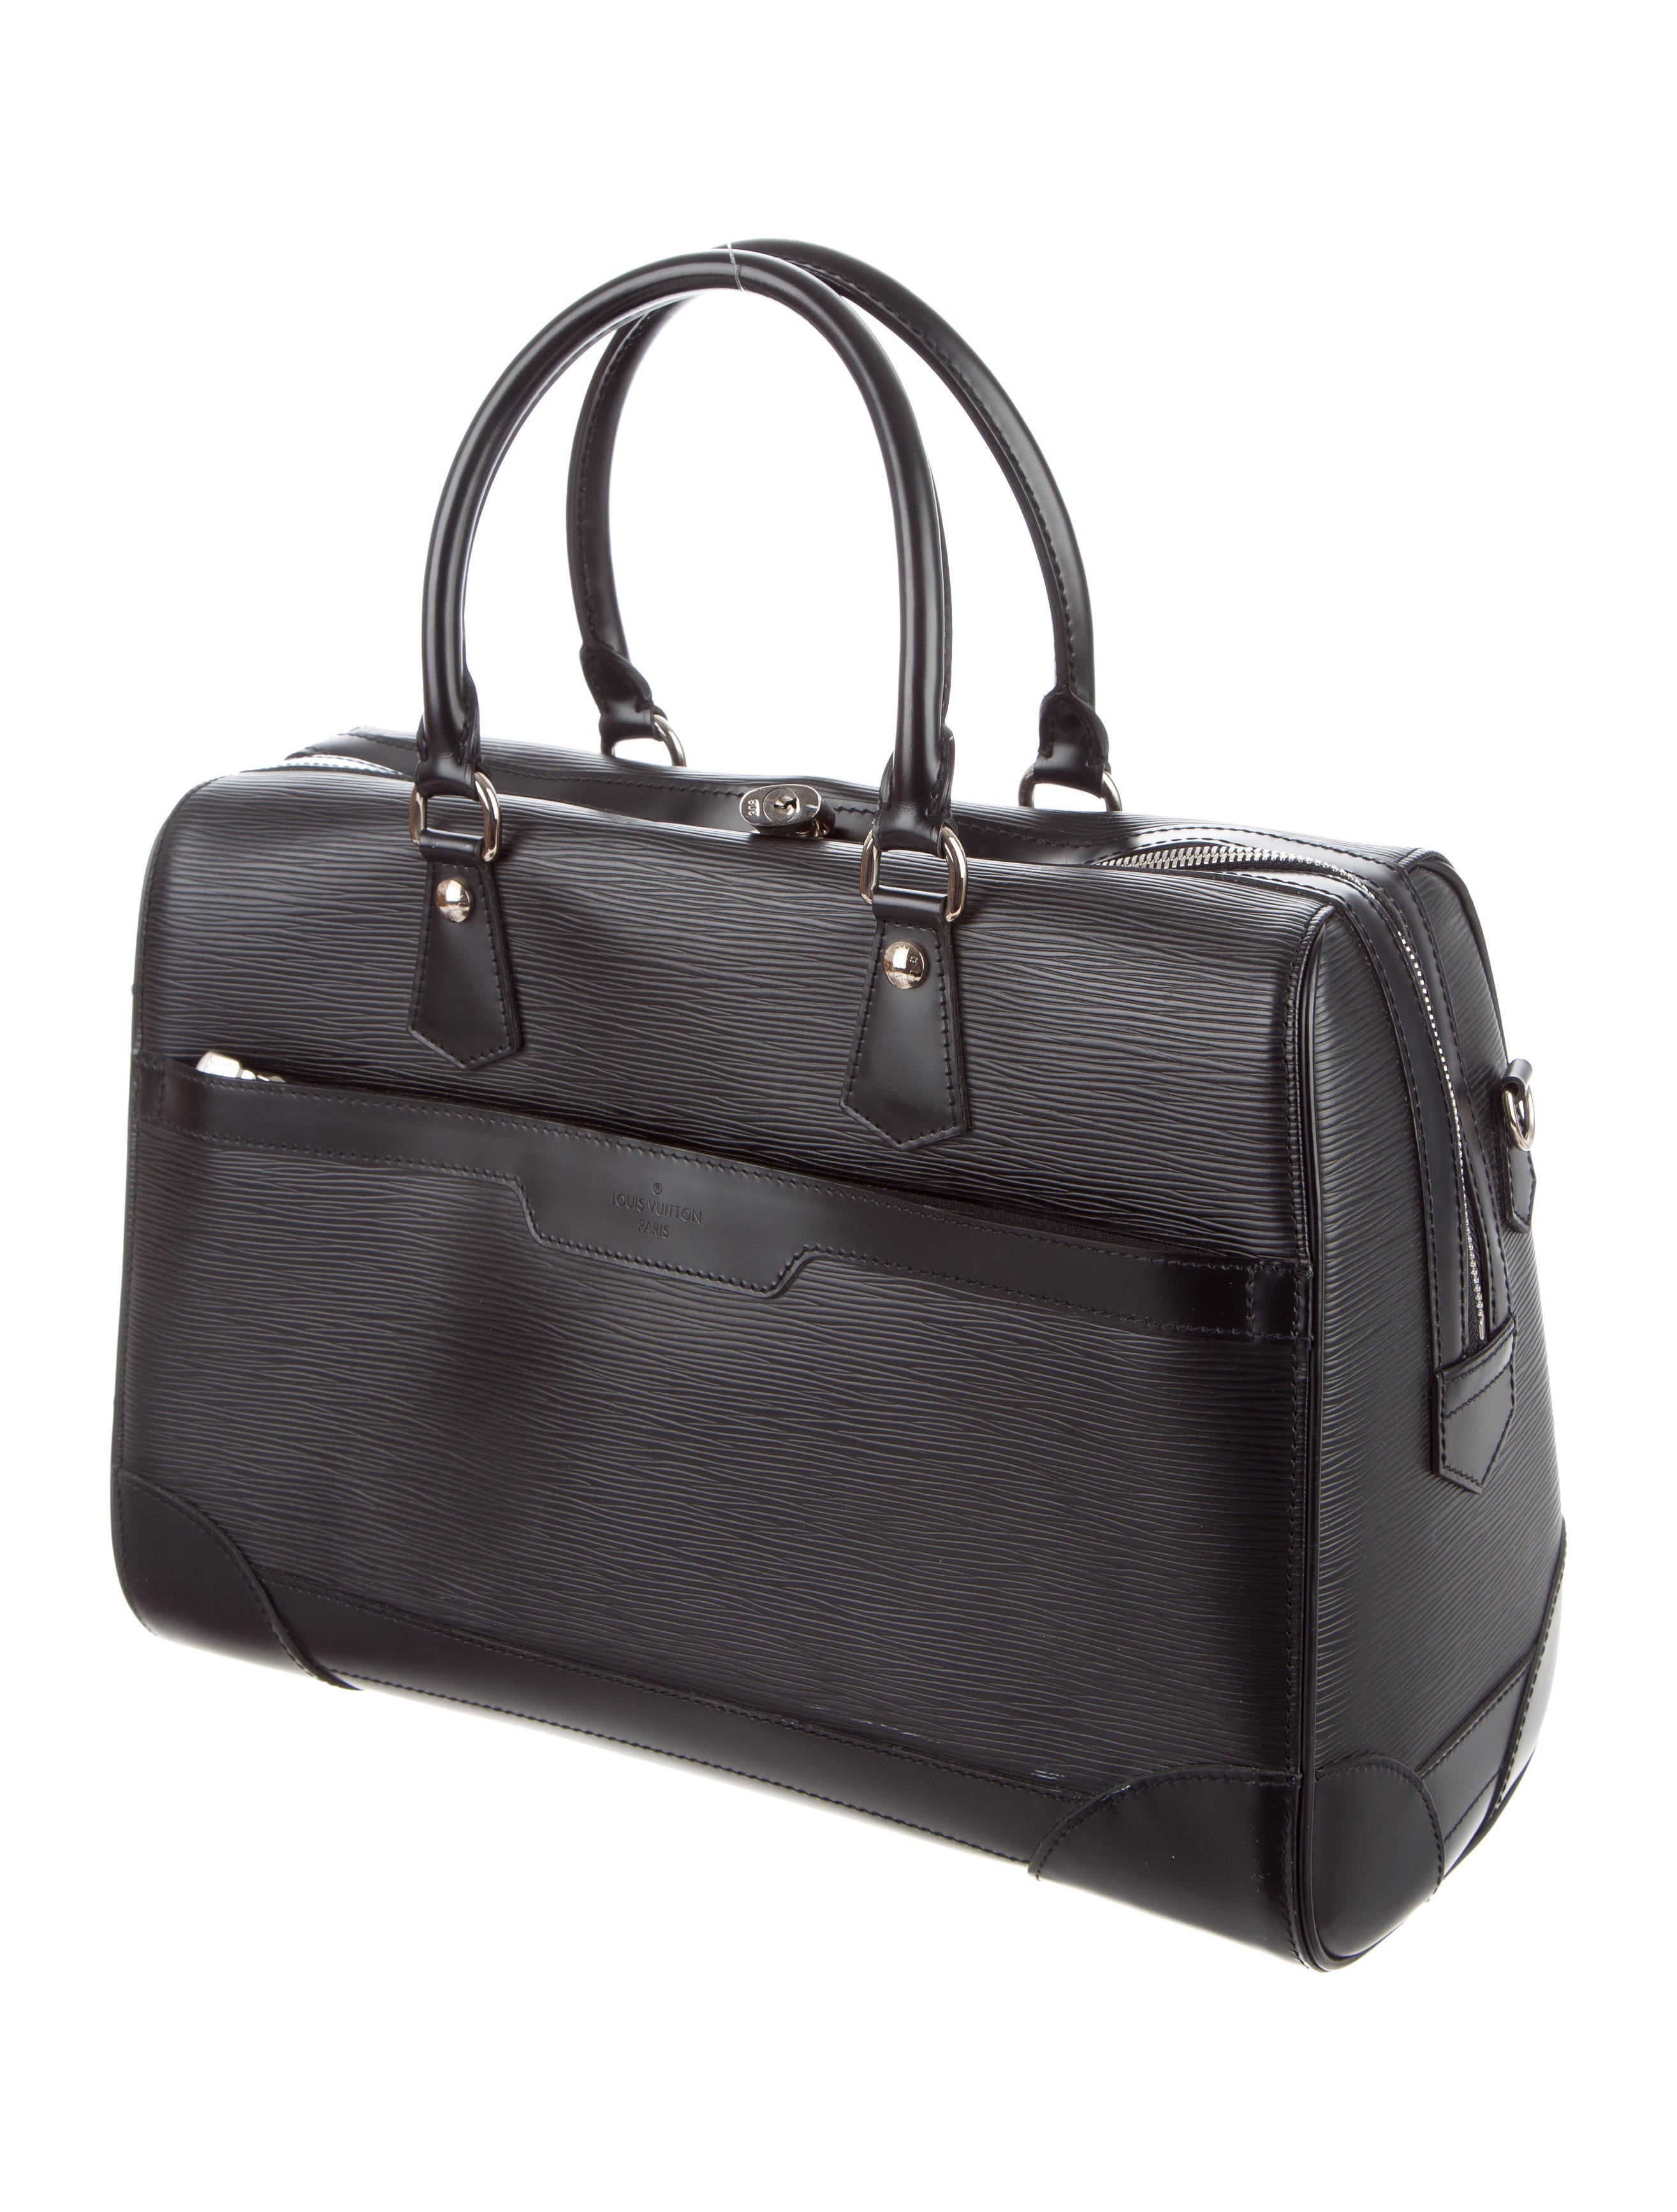 louis vuitton epi sac de voyage bourget handbags. Black Bedroom Furniture Sets. Home Design Ideas